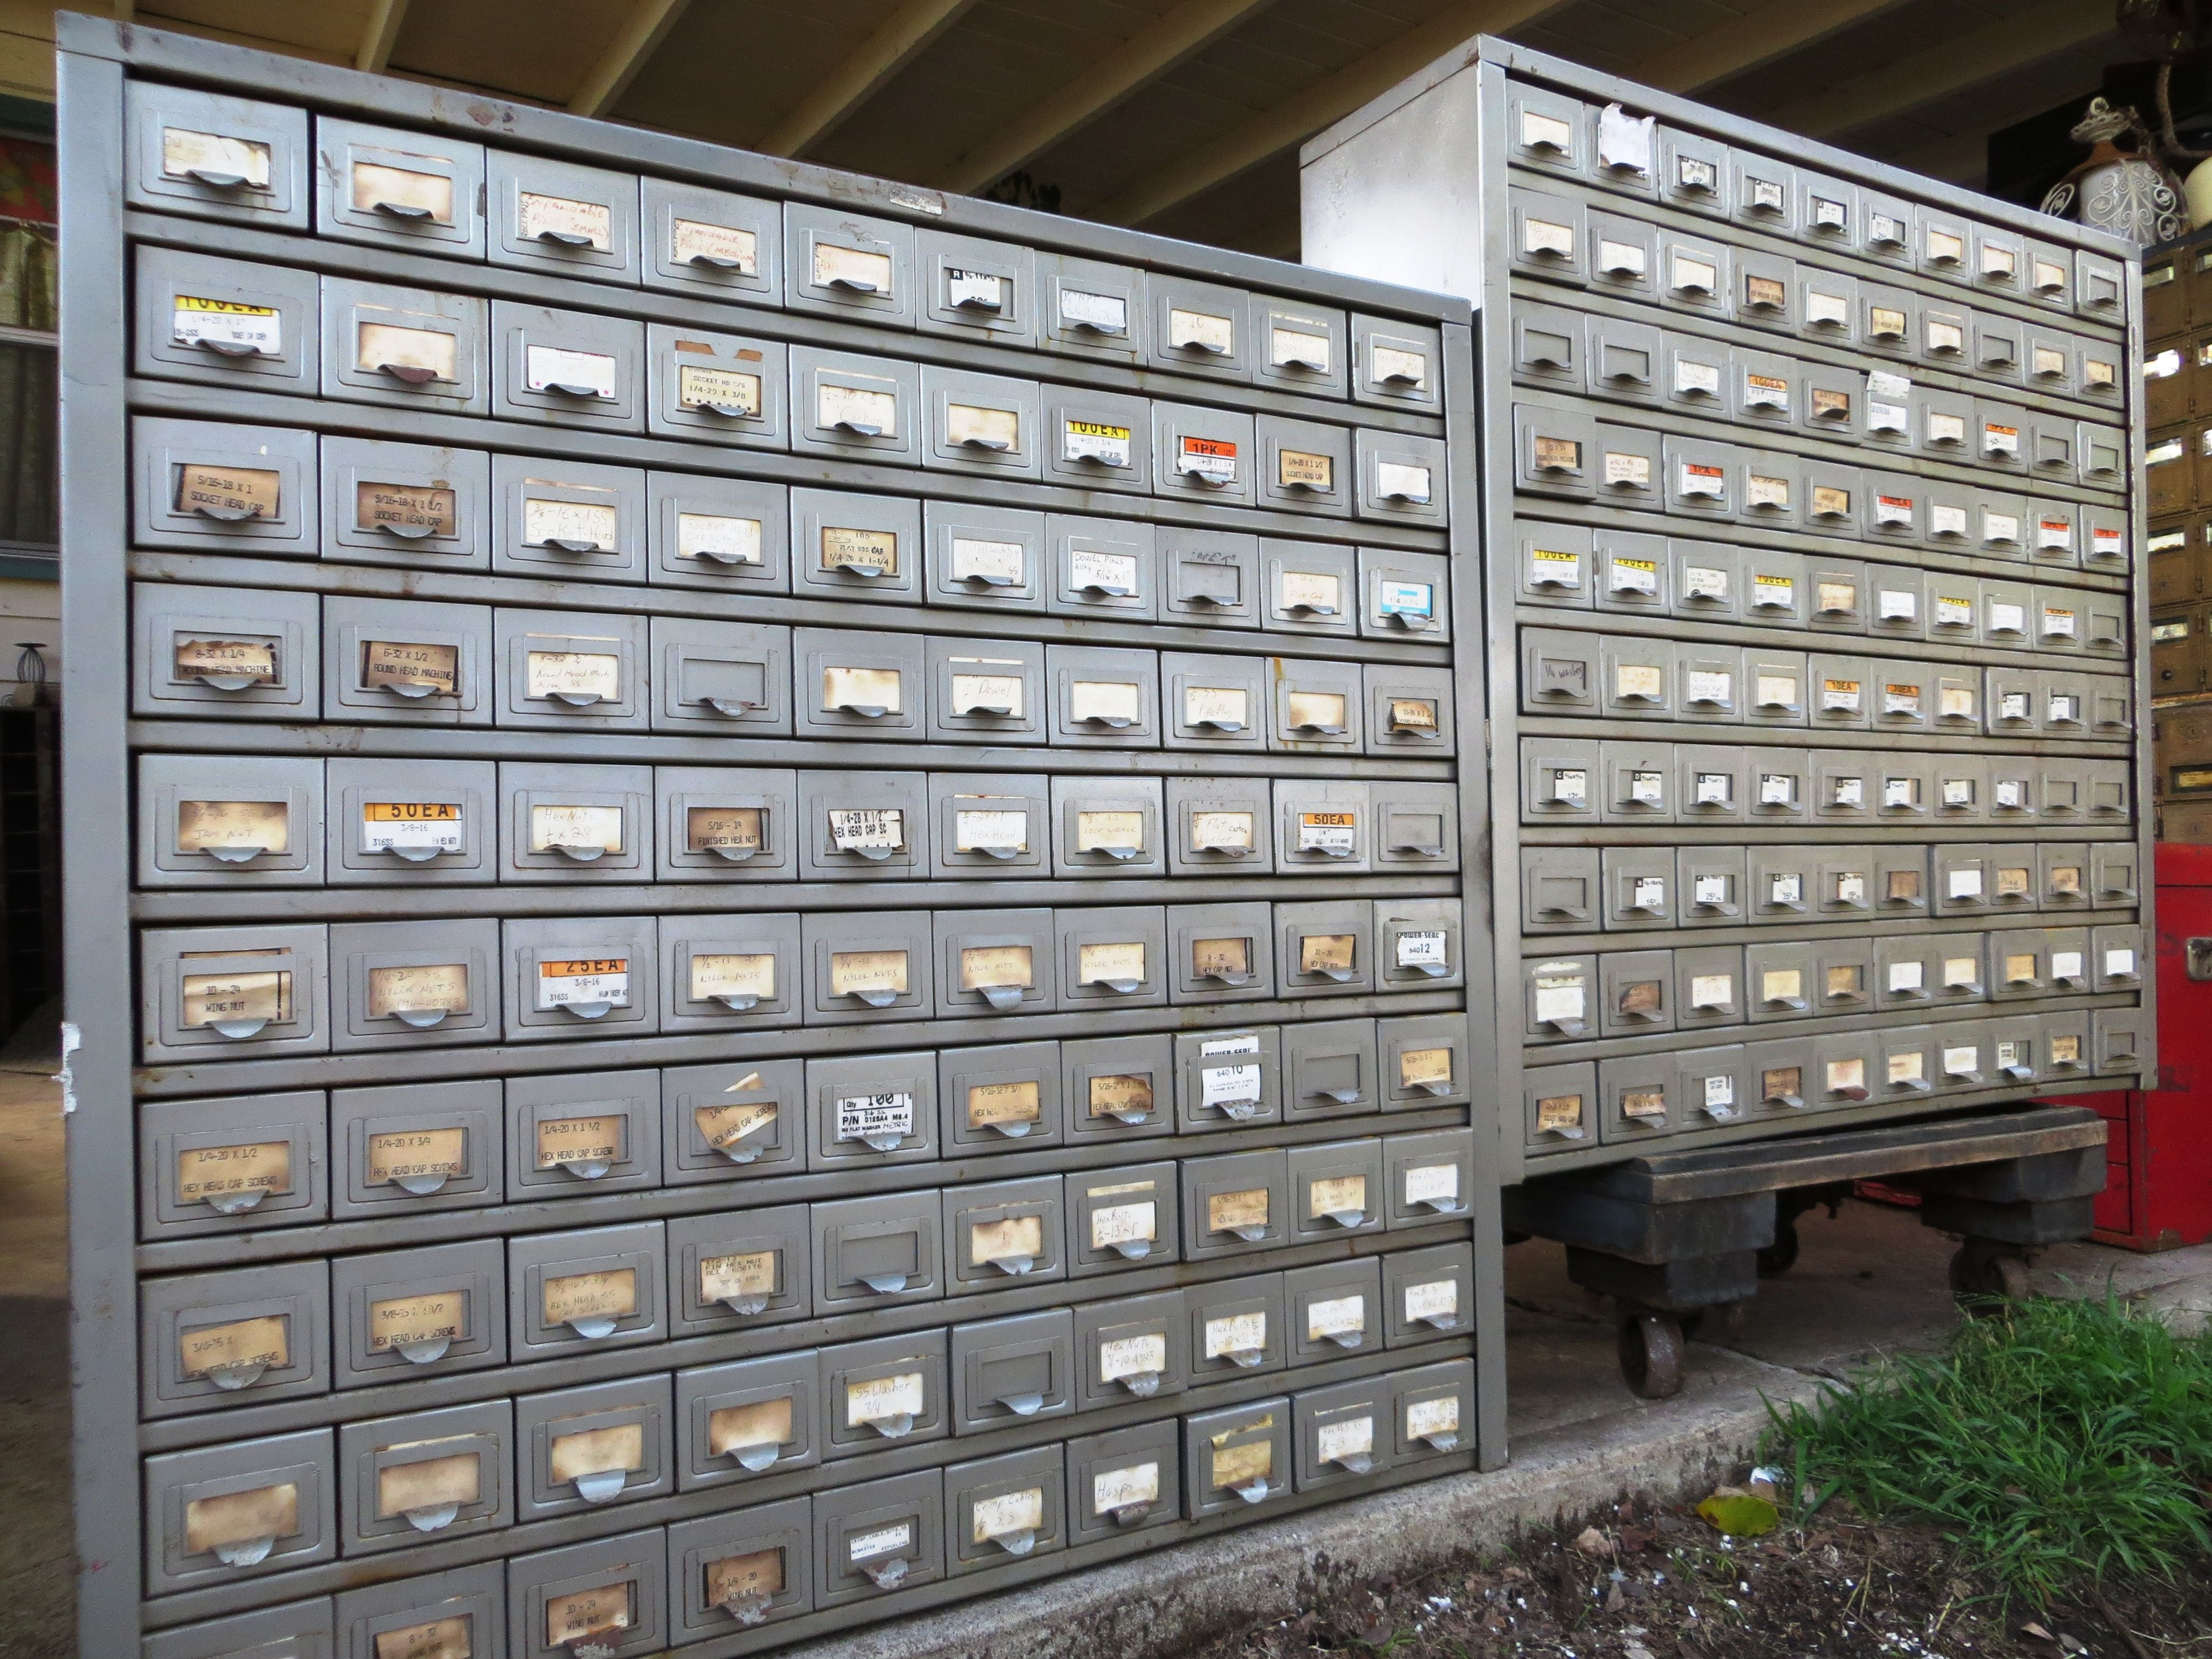 Pair Of 100 Drawer Steel Hardware Organizer Cabinets By Merlesvintage Hardware Organizer Cabinets Organization Steel Hardware